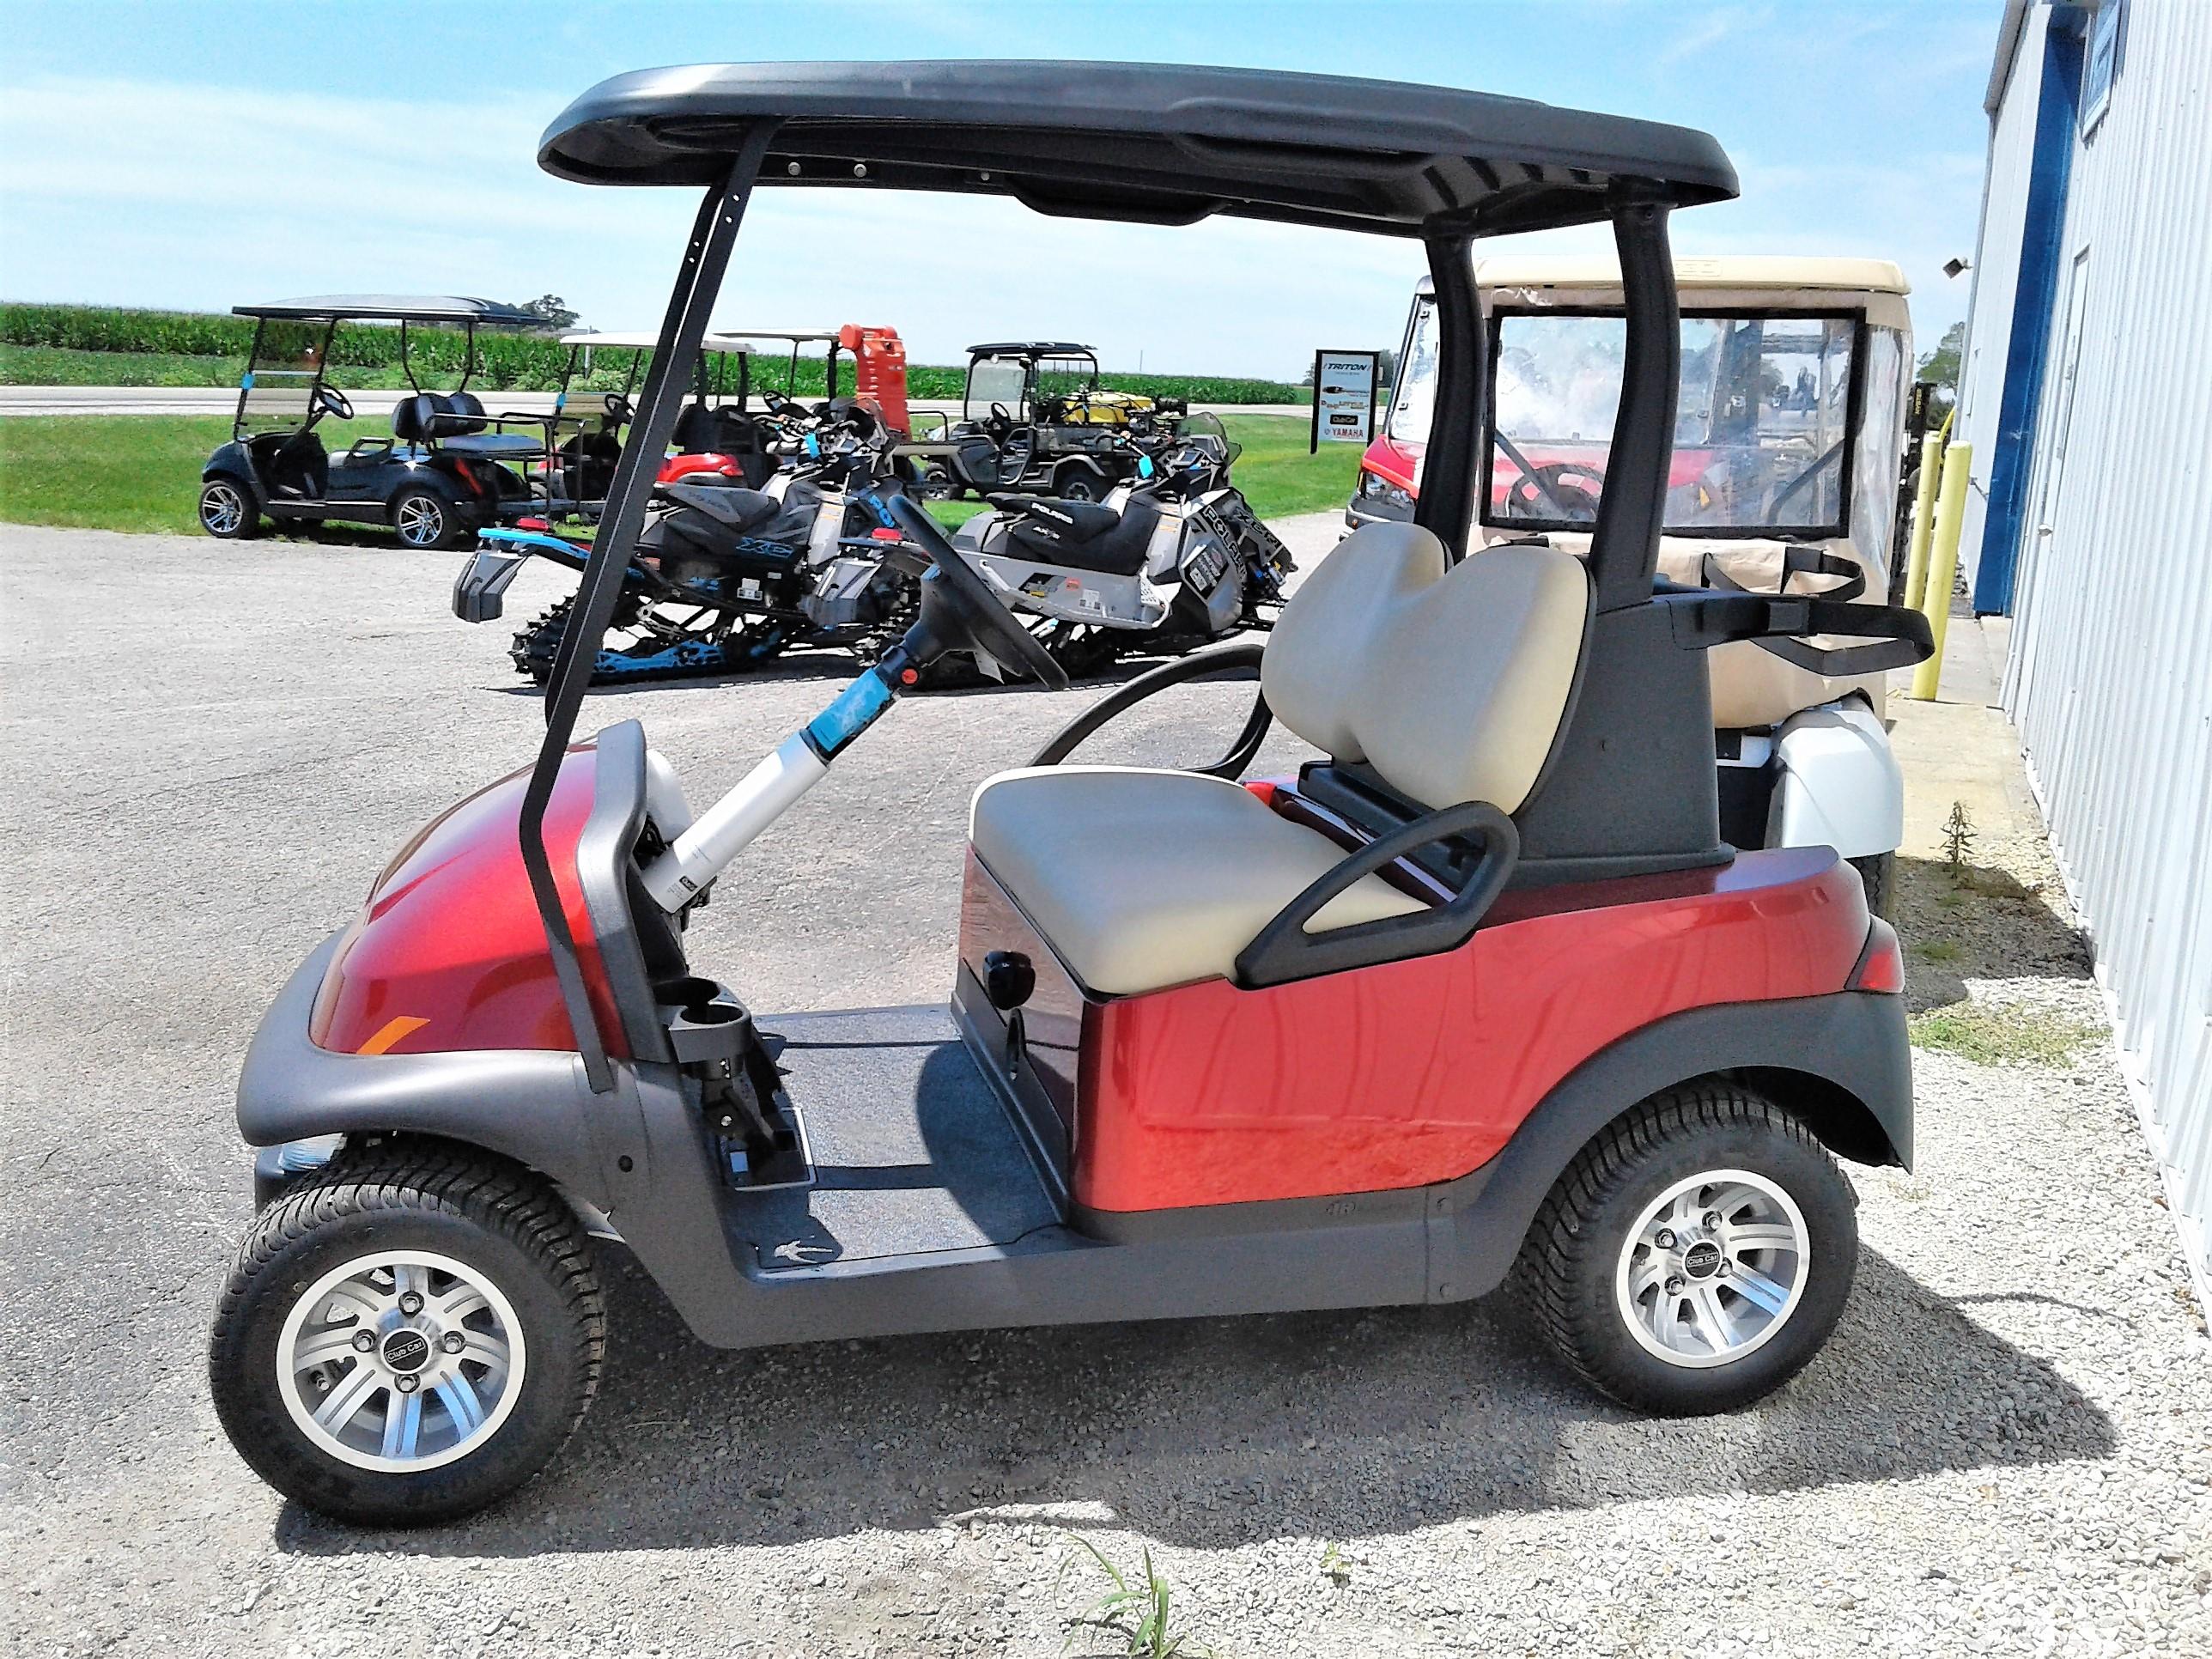 Golf Carts From Club Car Hendren S Sport Center Gridley Il 309 747 2596